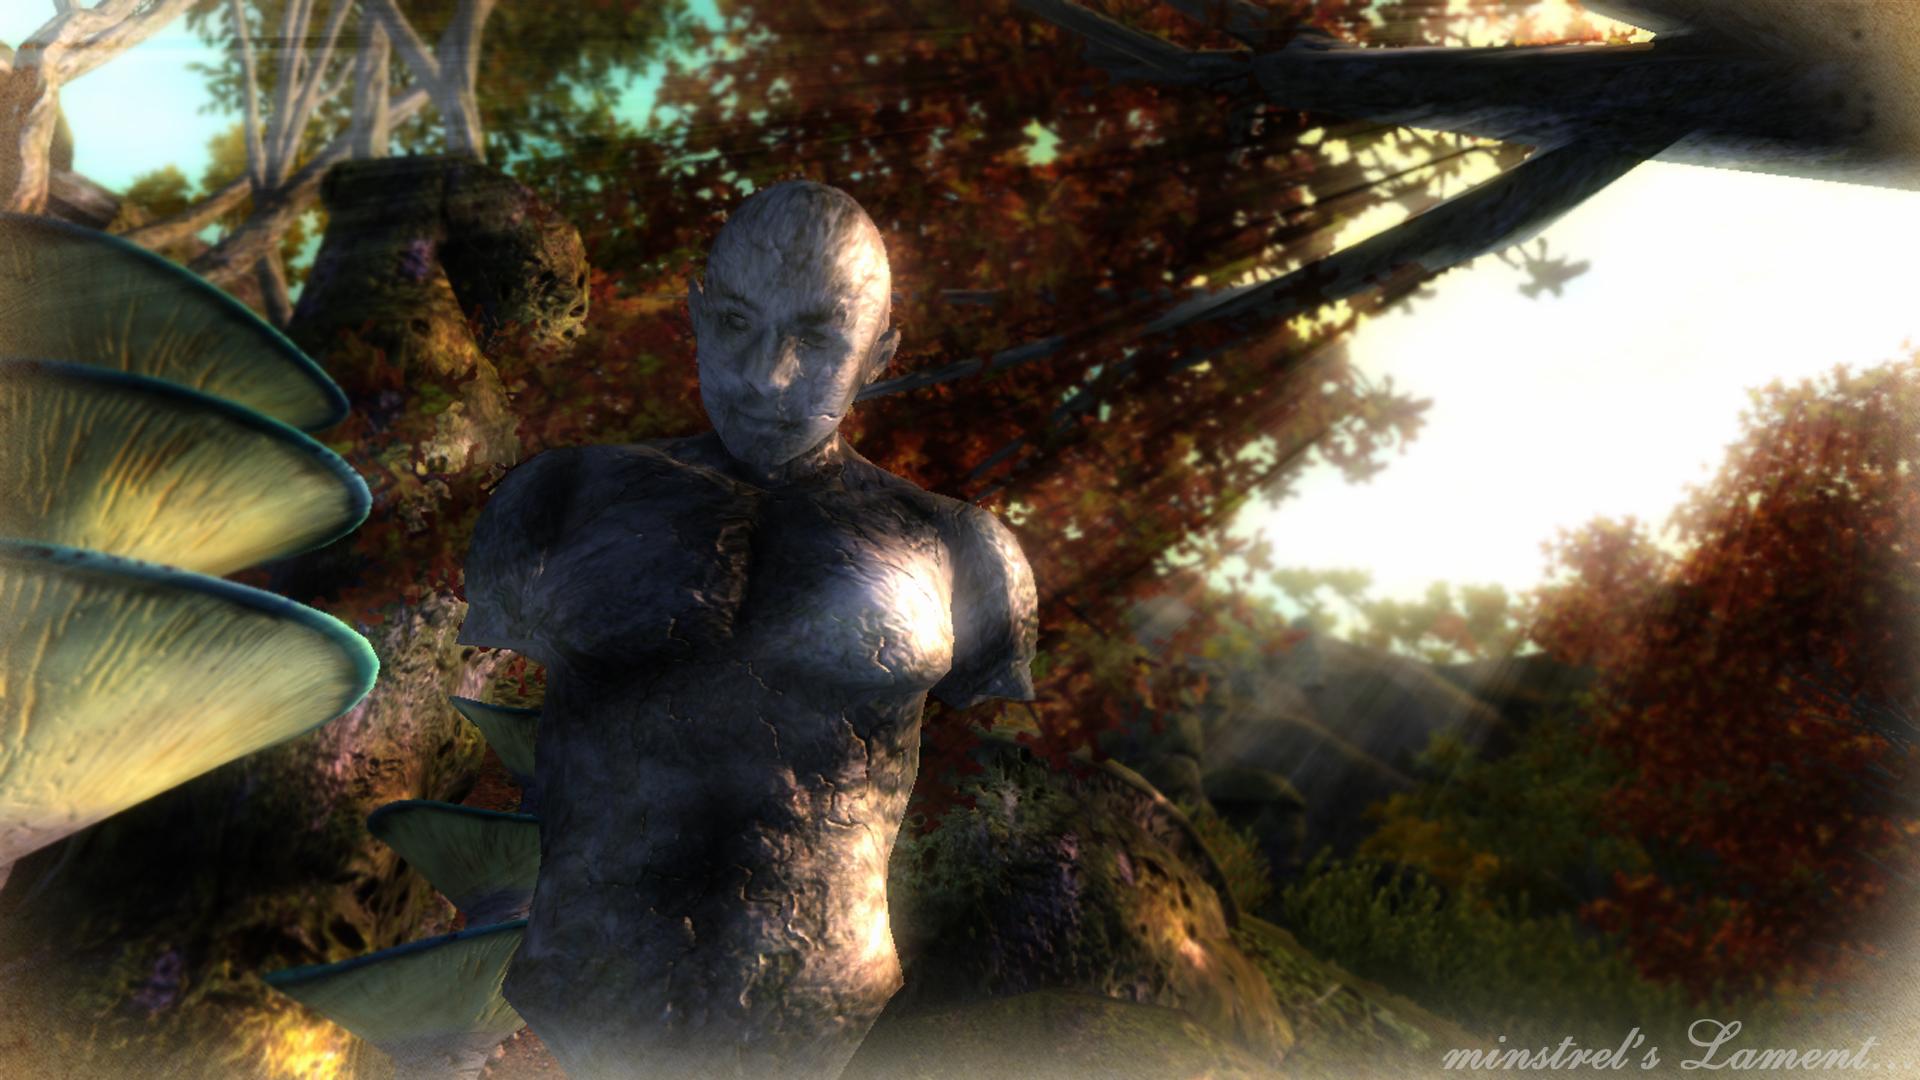 The Elder Scrolls: Oblivion Nostalgia Wallpaper #2 by ...